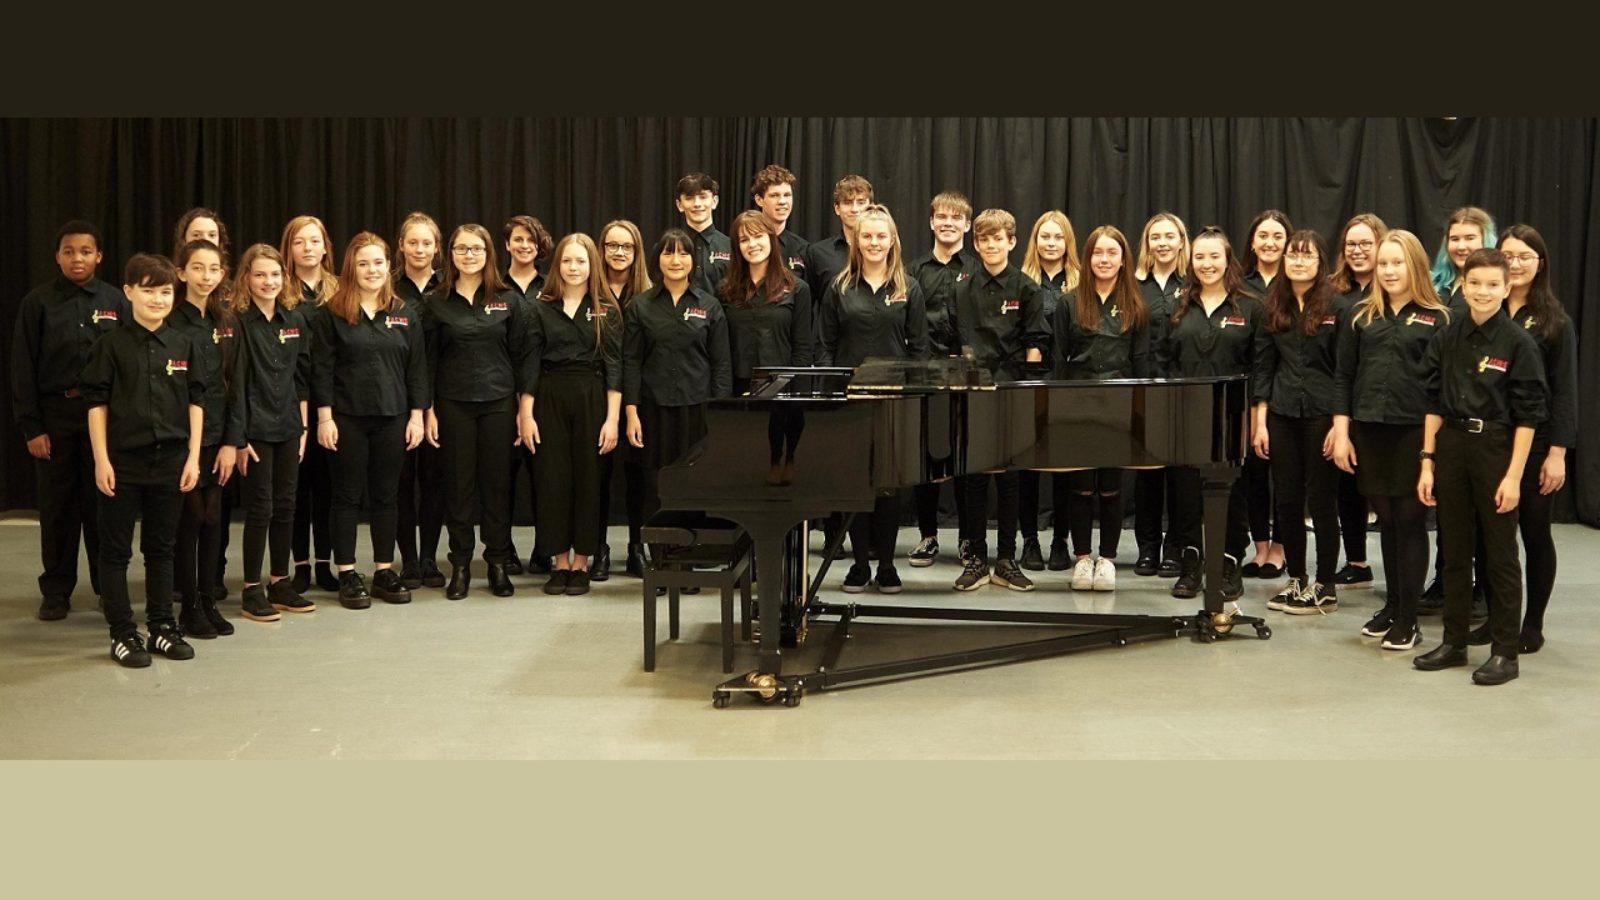 Aberdeen City Music School beats lockdown with online end of term concert